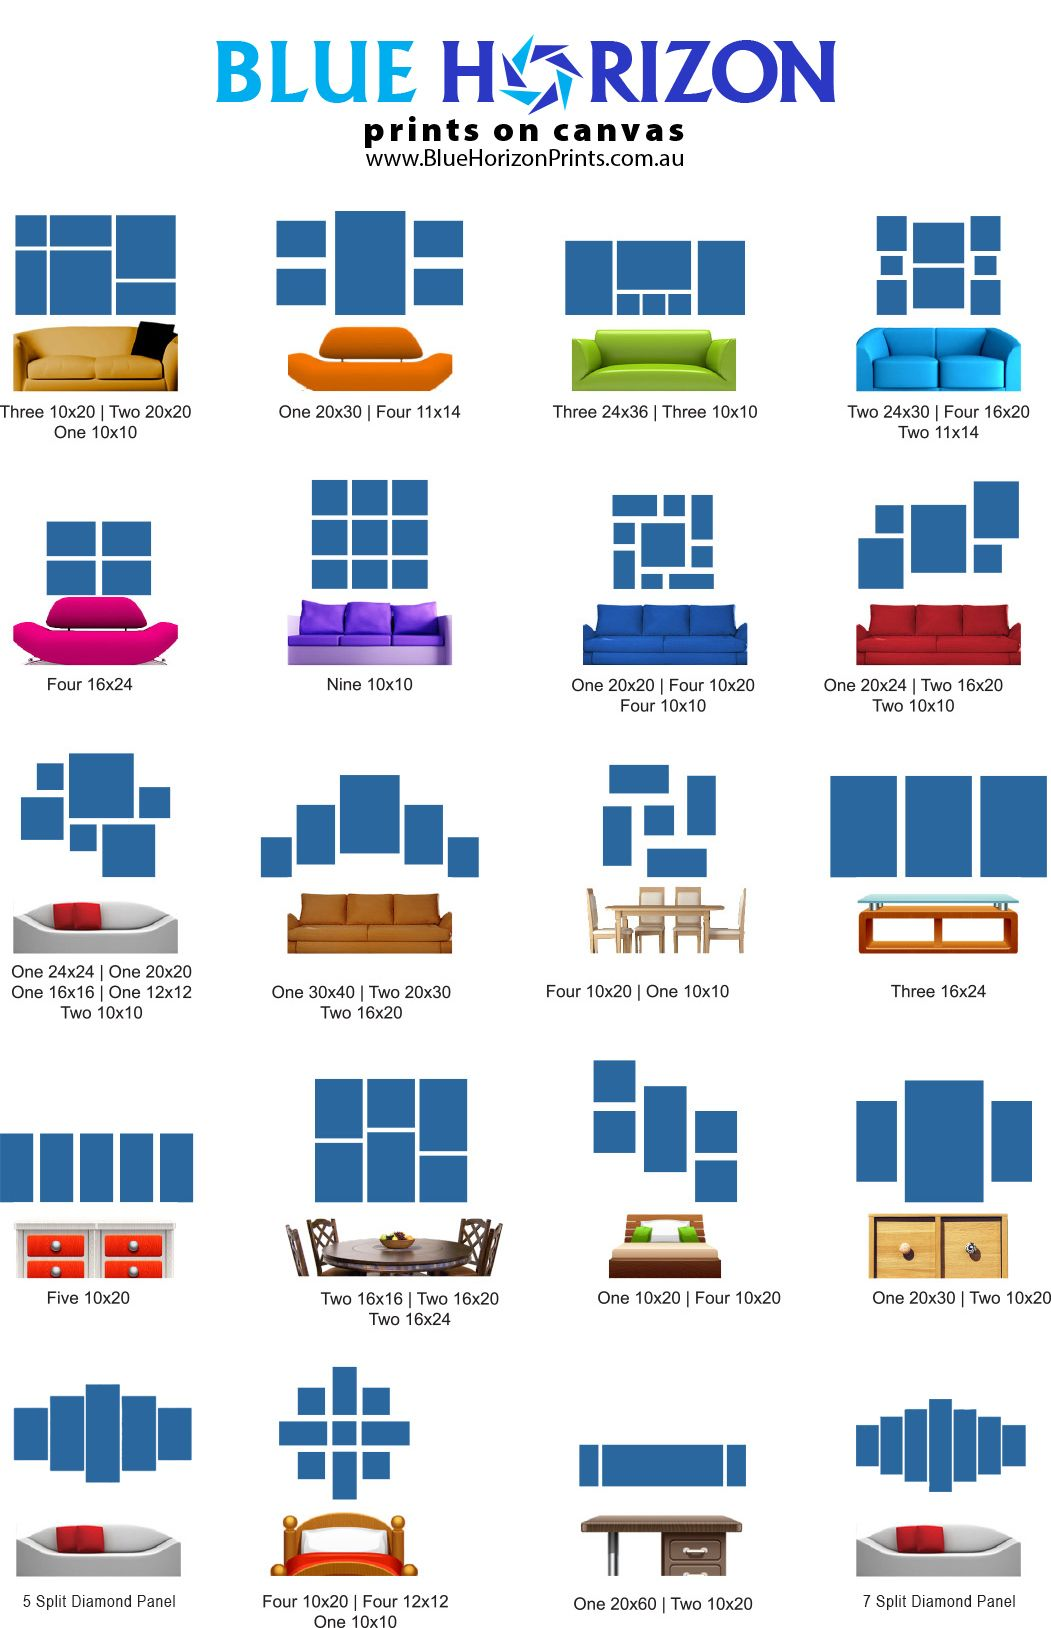 Great Wall Art Layout Ideas For Your Home Using Split Panel Art Layout Combinations M Dicas De Design De Interiores Decoracao Sala Quadros Retratos Na Parede